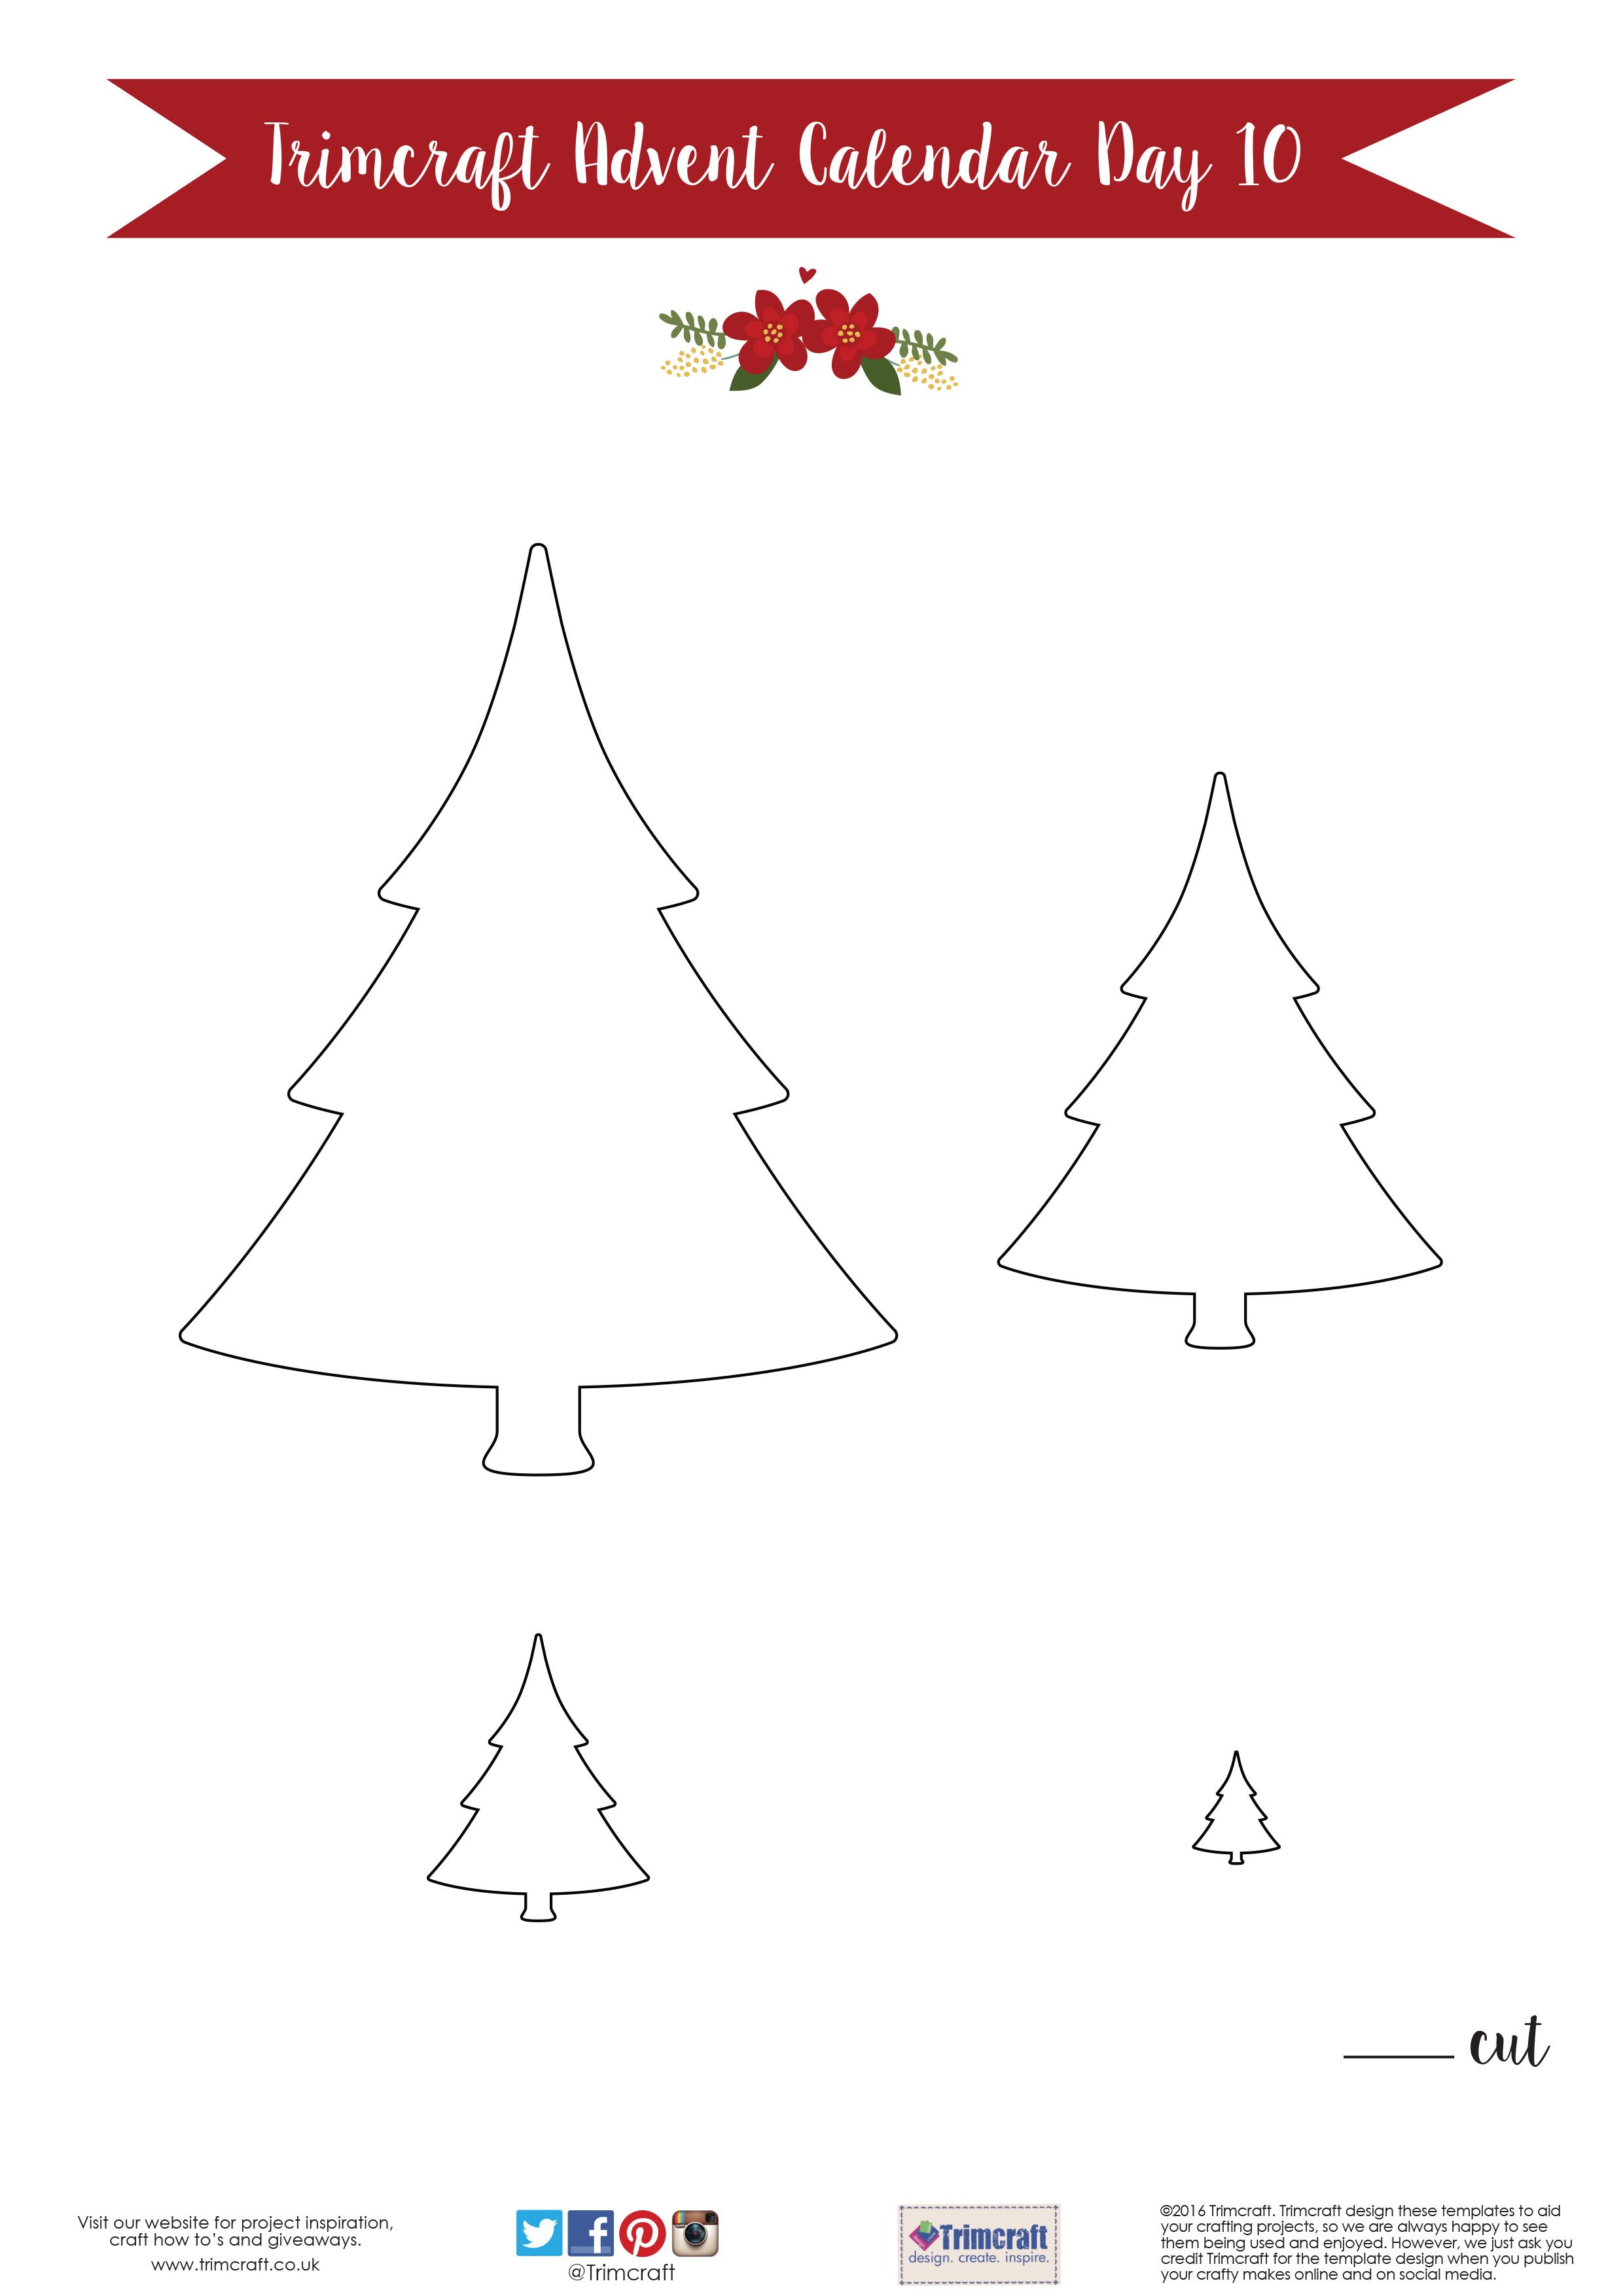 Free Printable Craft Templates | The Craft Blog within Printable Christmas Tree Templates 3D